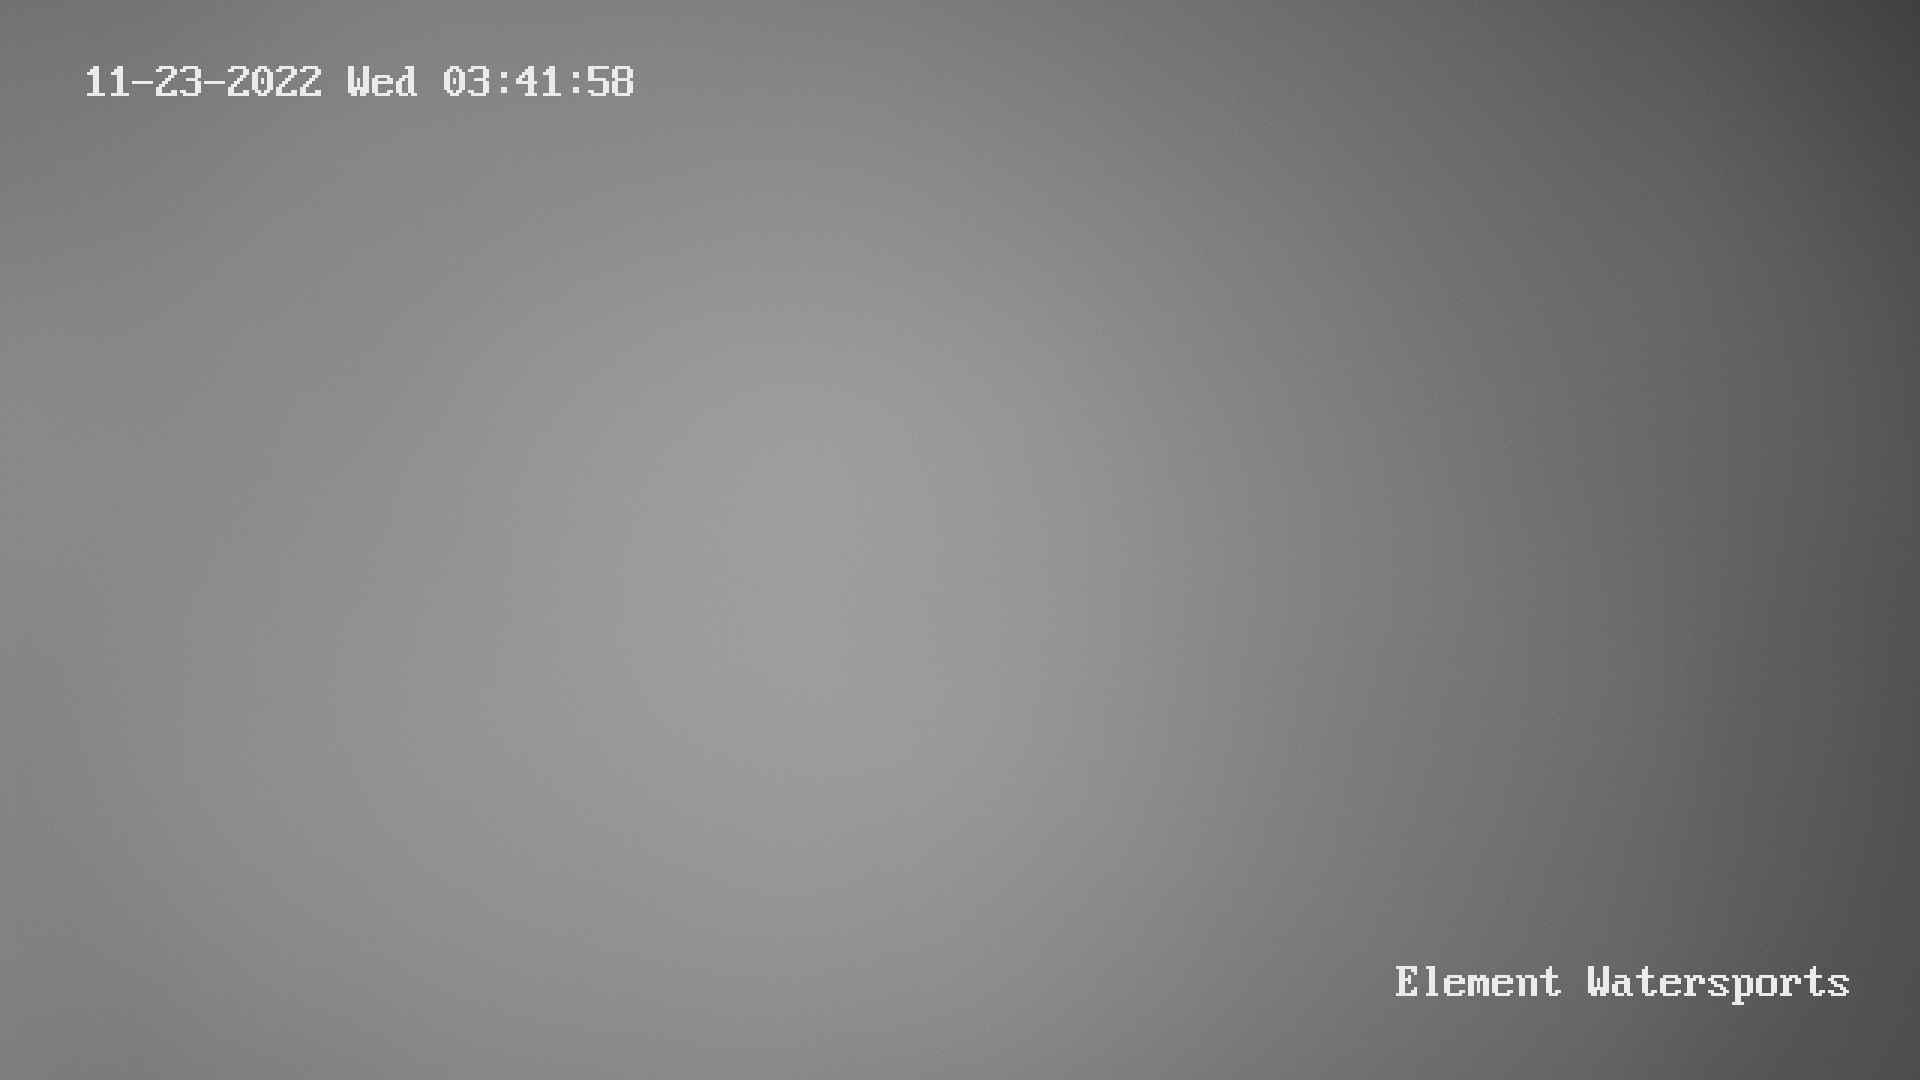 Livecam Element Watersports kitsurfing - kiteborarding - windsurfing El Gouna